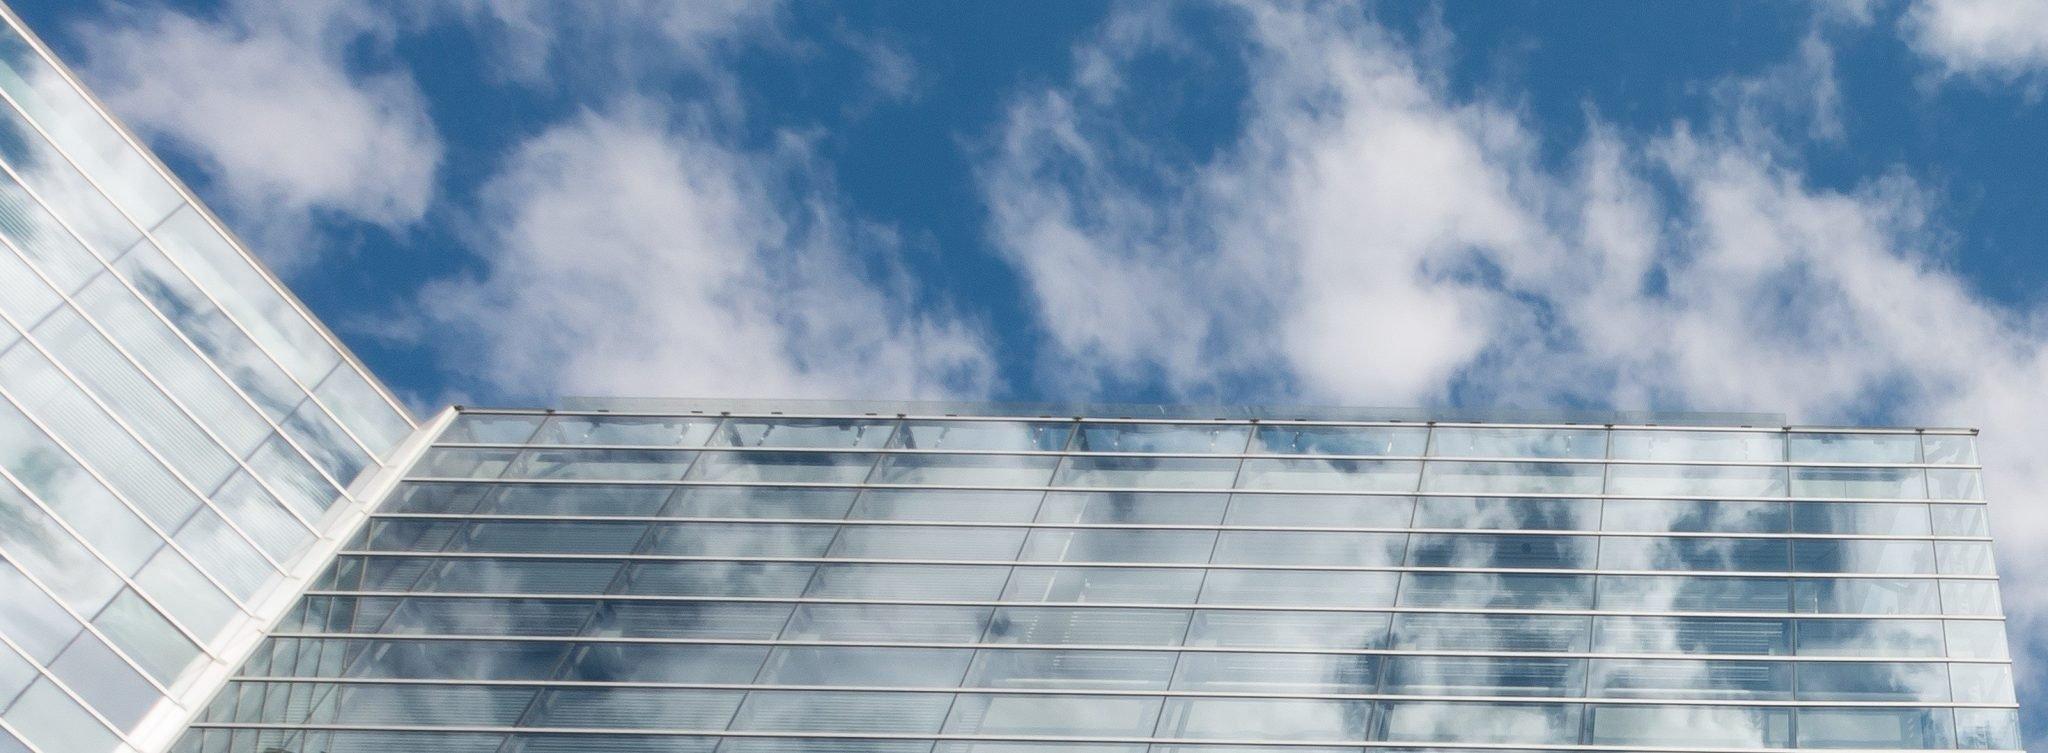 Private Cloud Servers